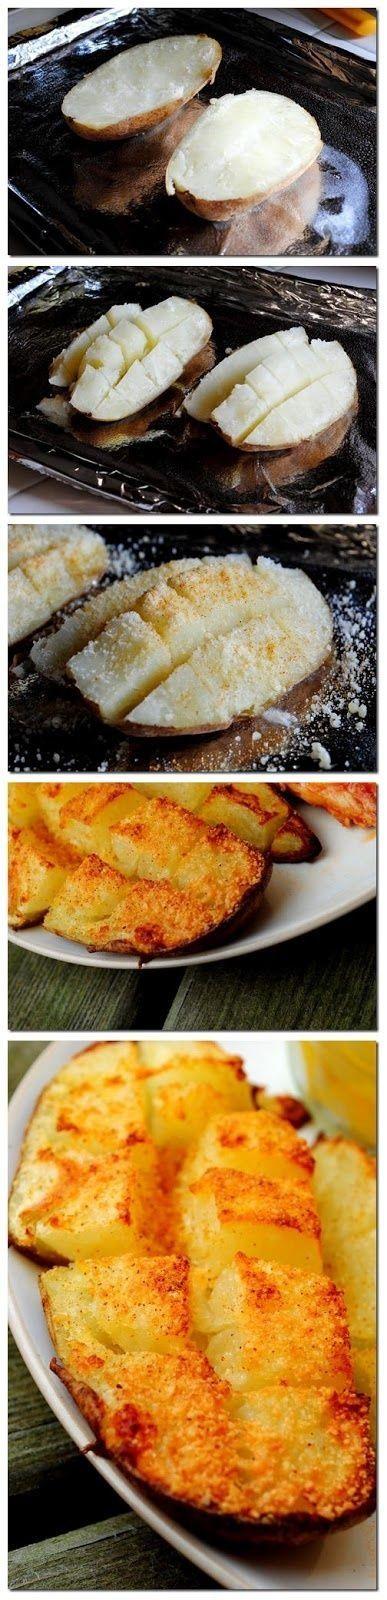 Seasoned roasted potatoes! Yum!